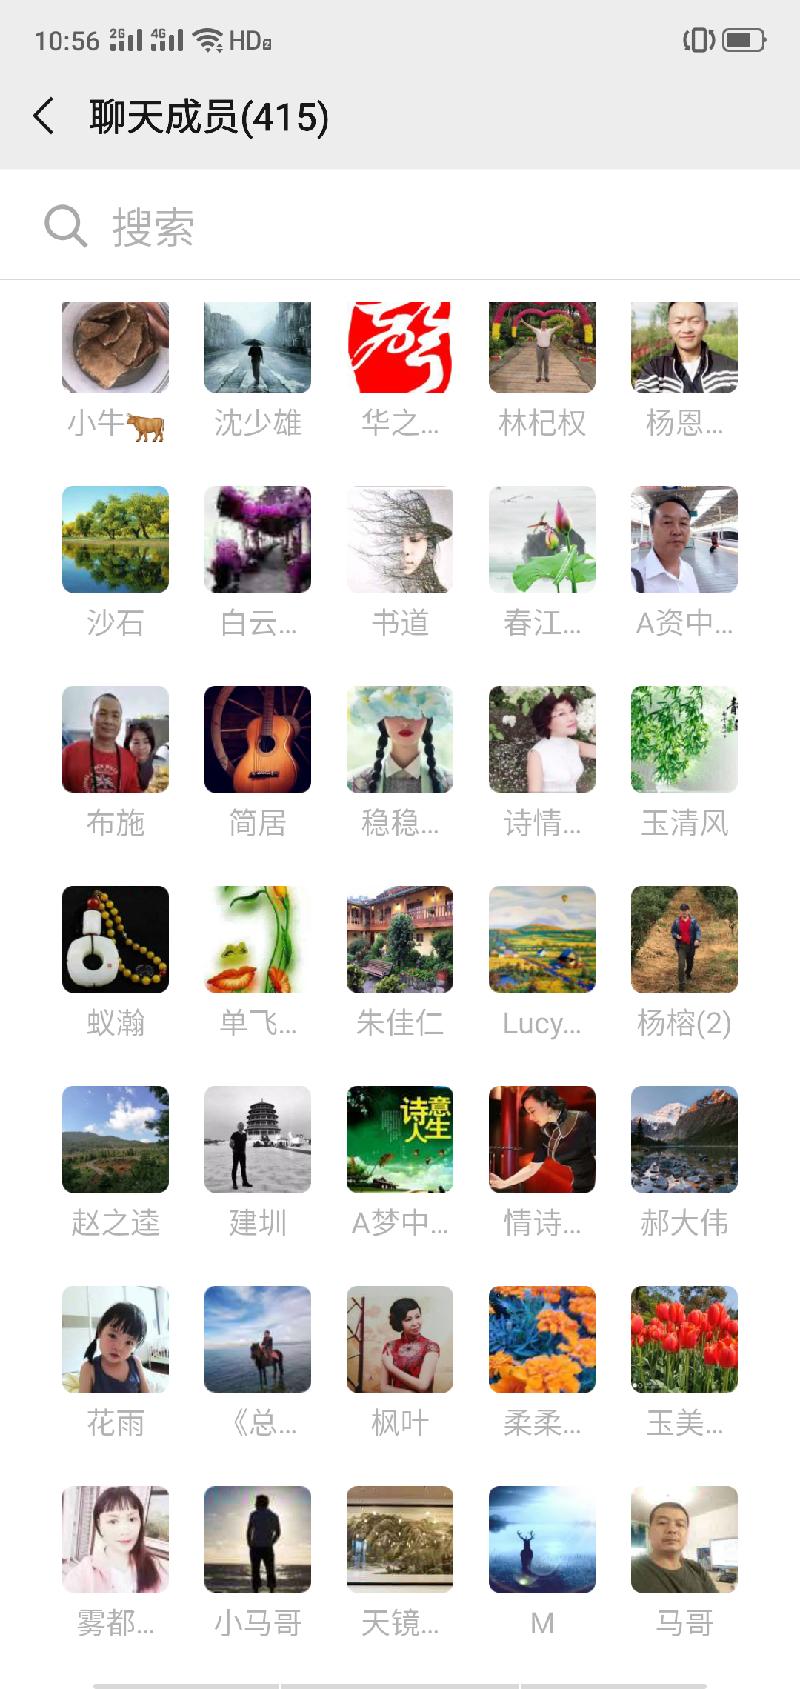 Screenshot_2020-01-15-10-56-05-03